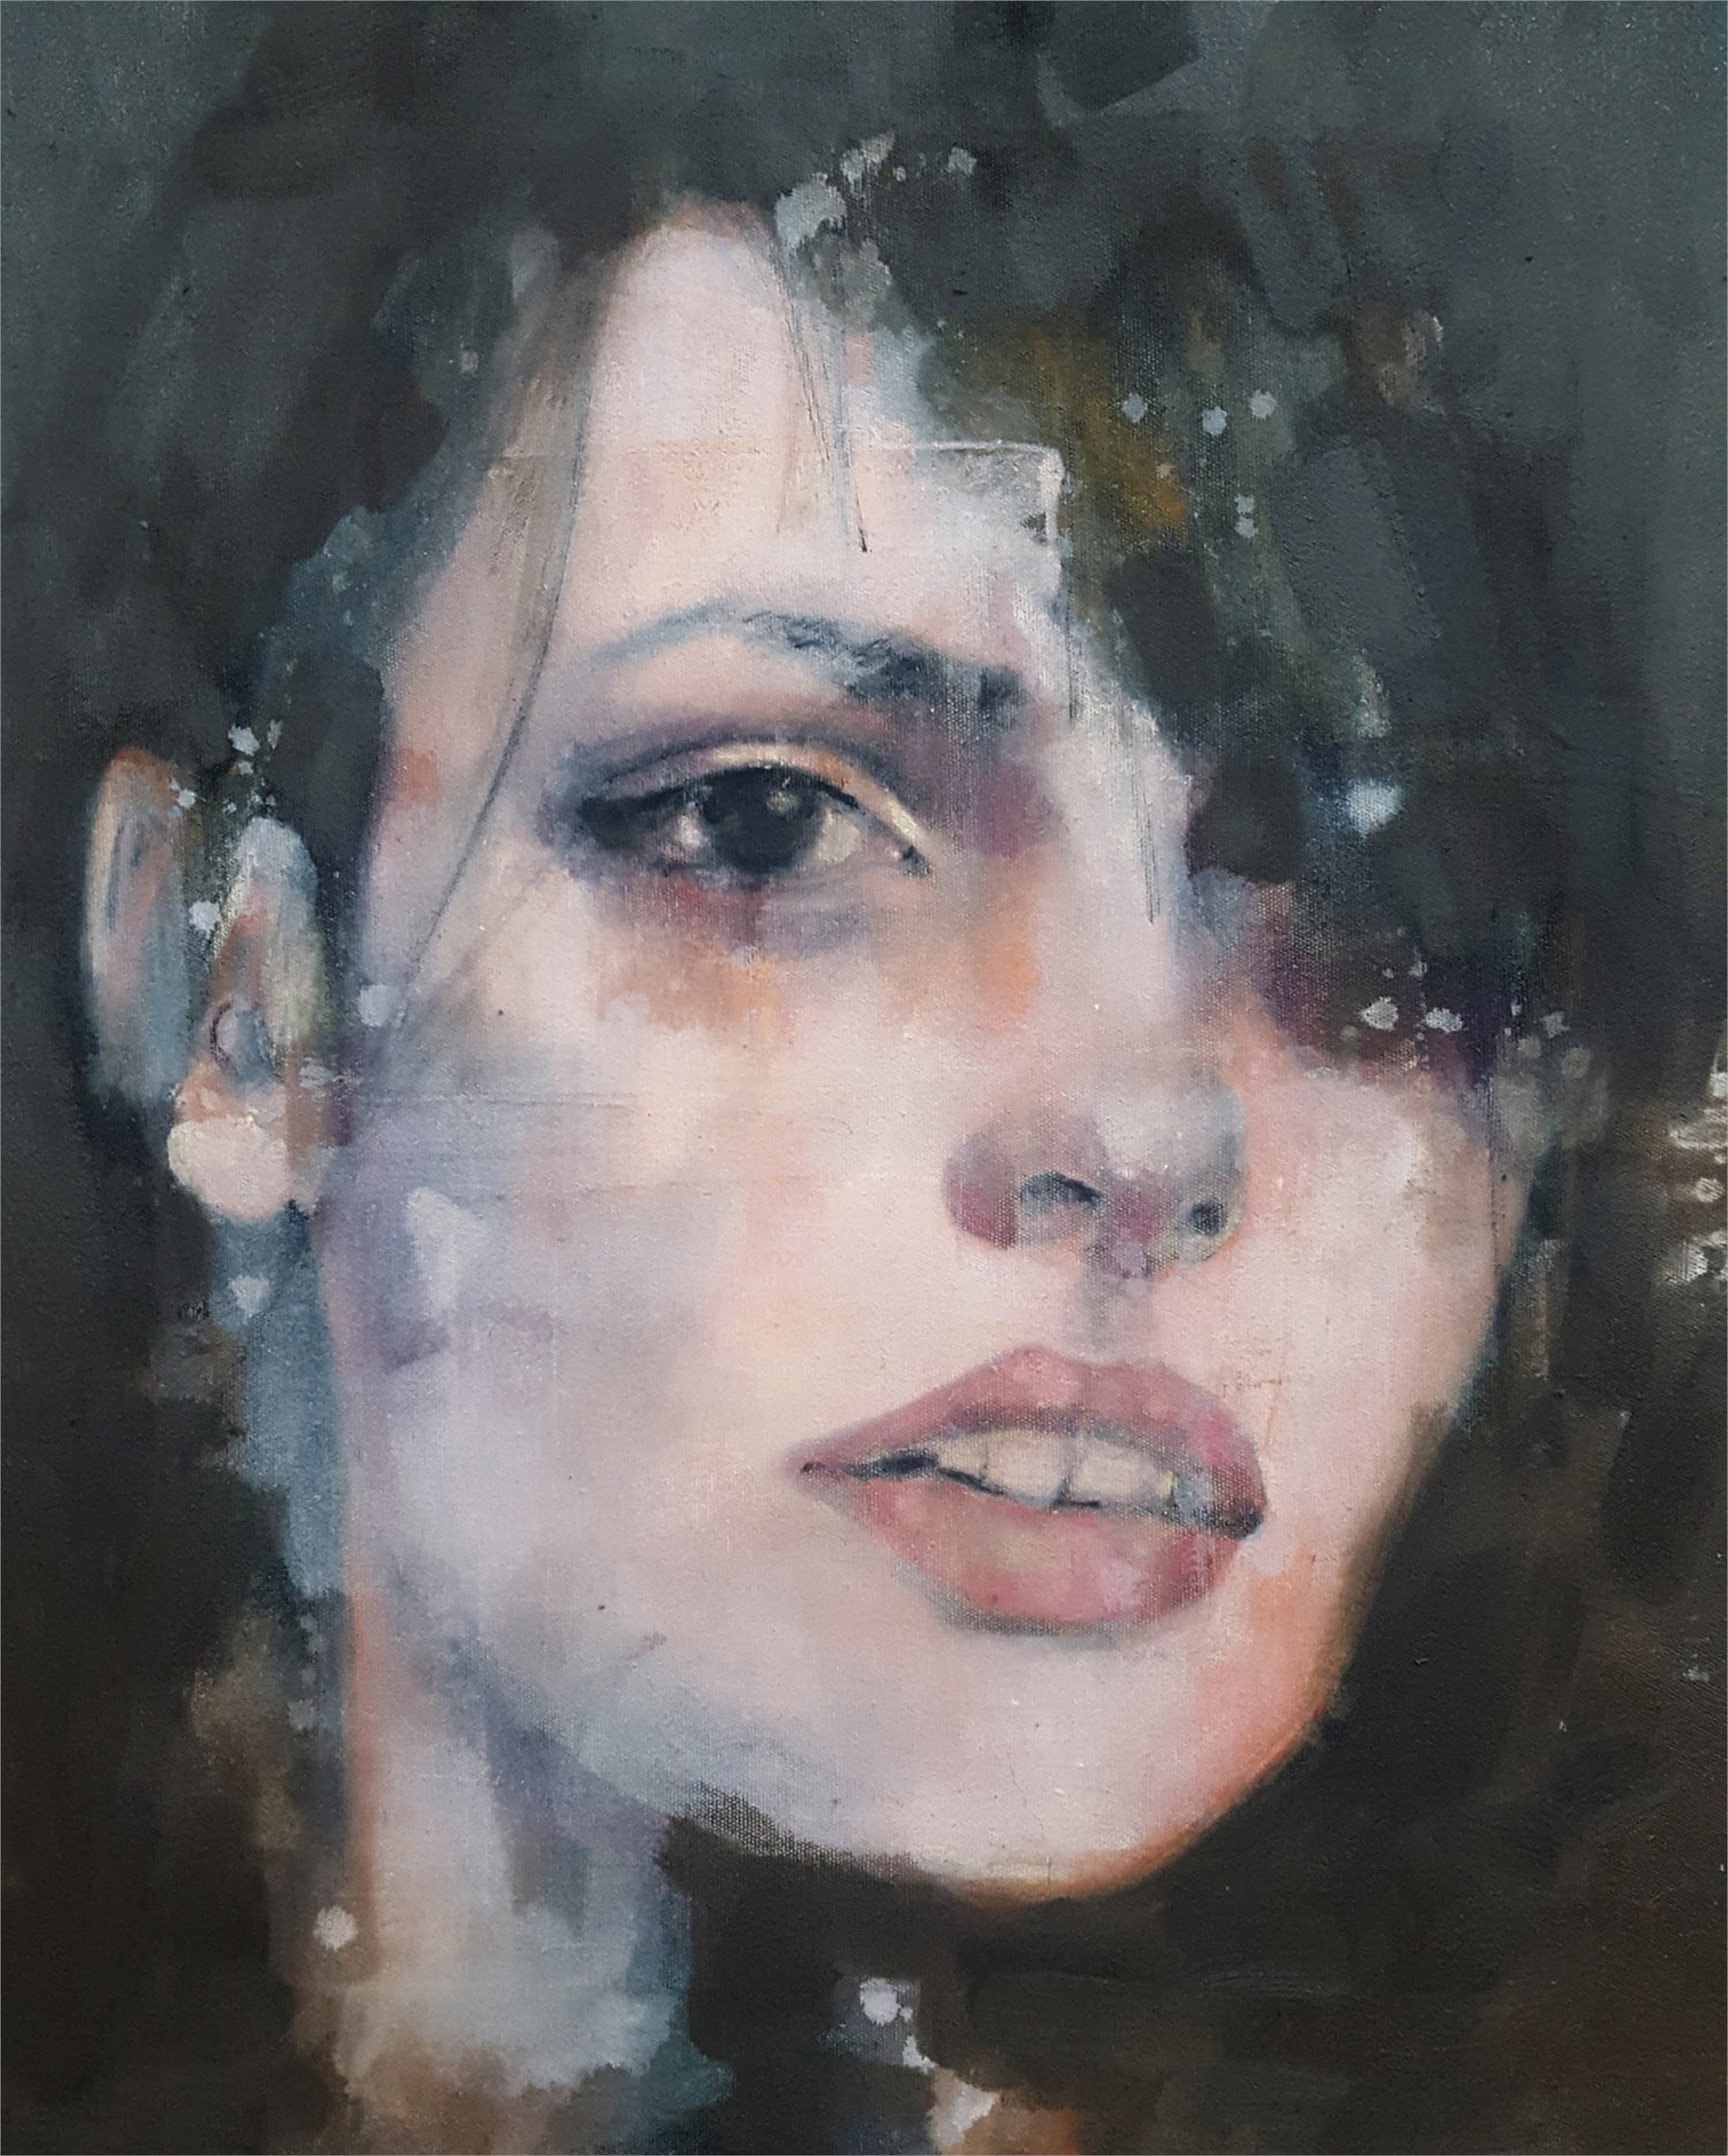 Melancholia by Thomas Johnson